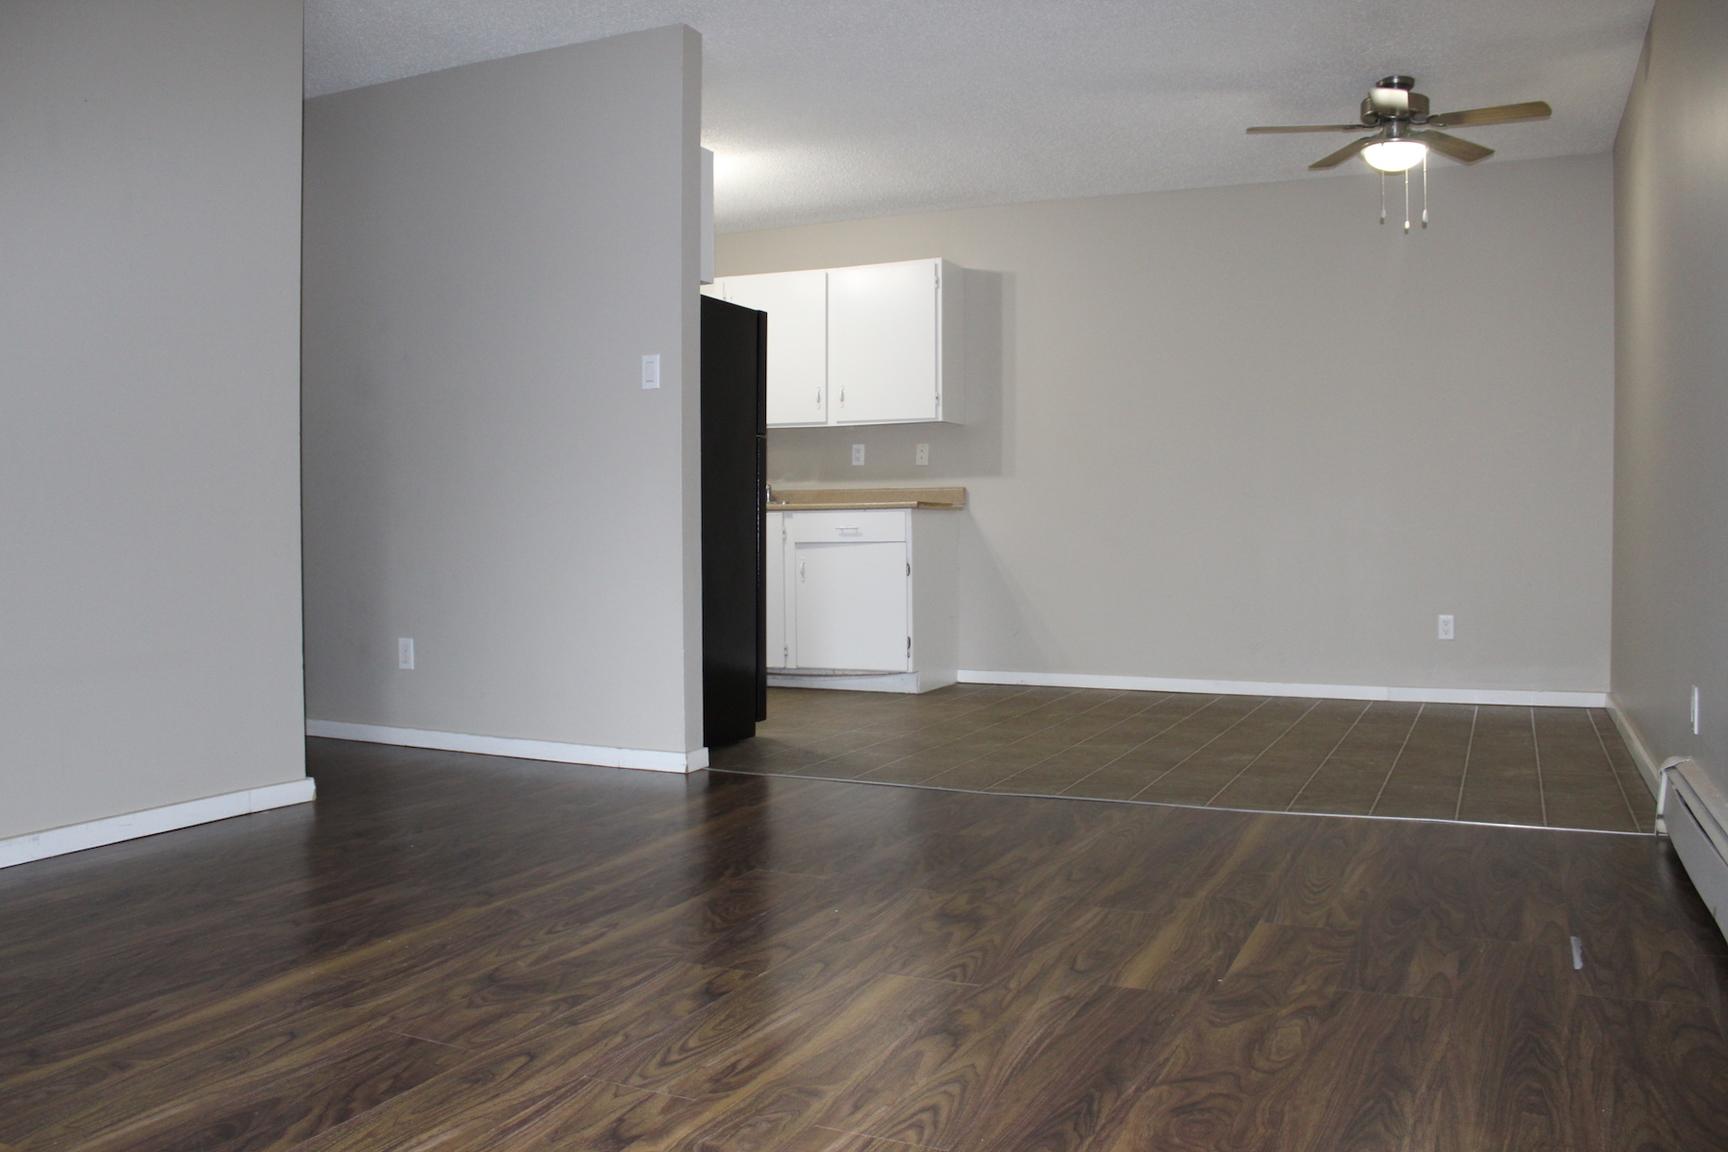 1622 22 Street West, Saskatoon, SK - $850